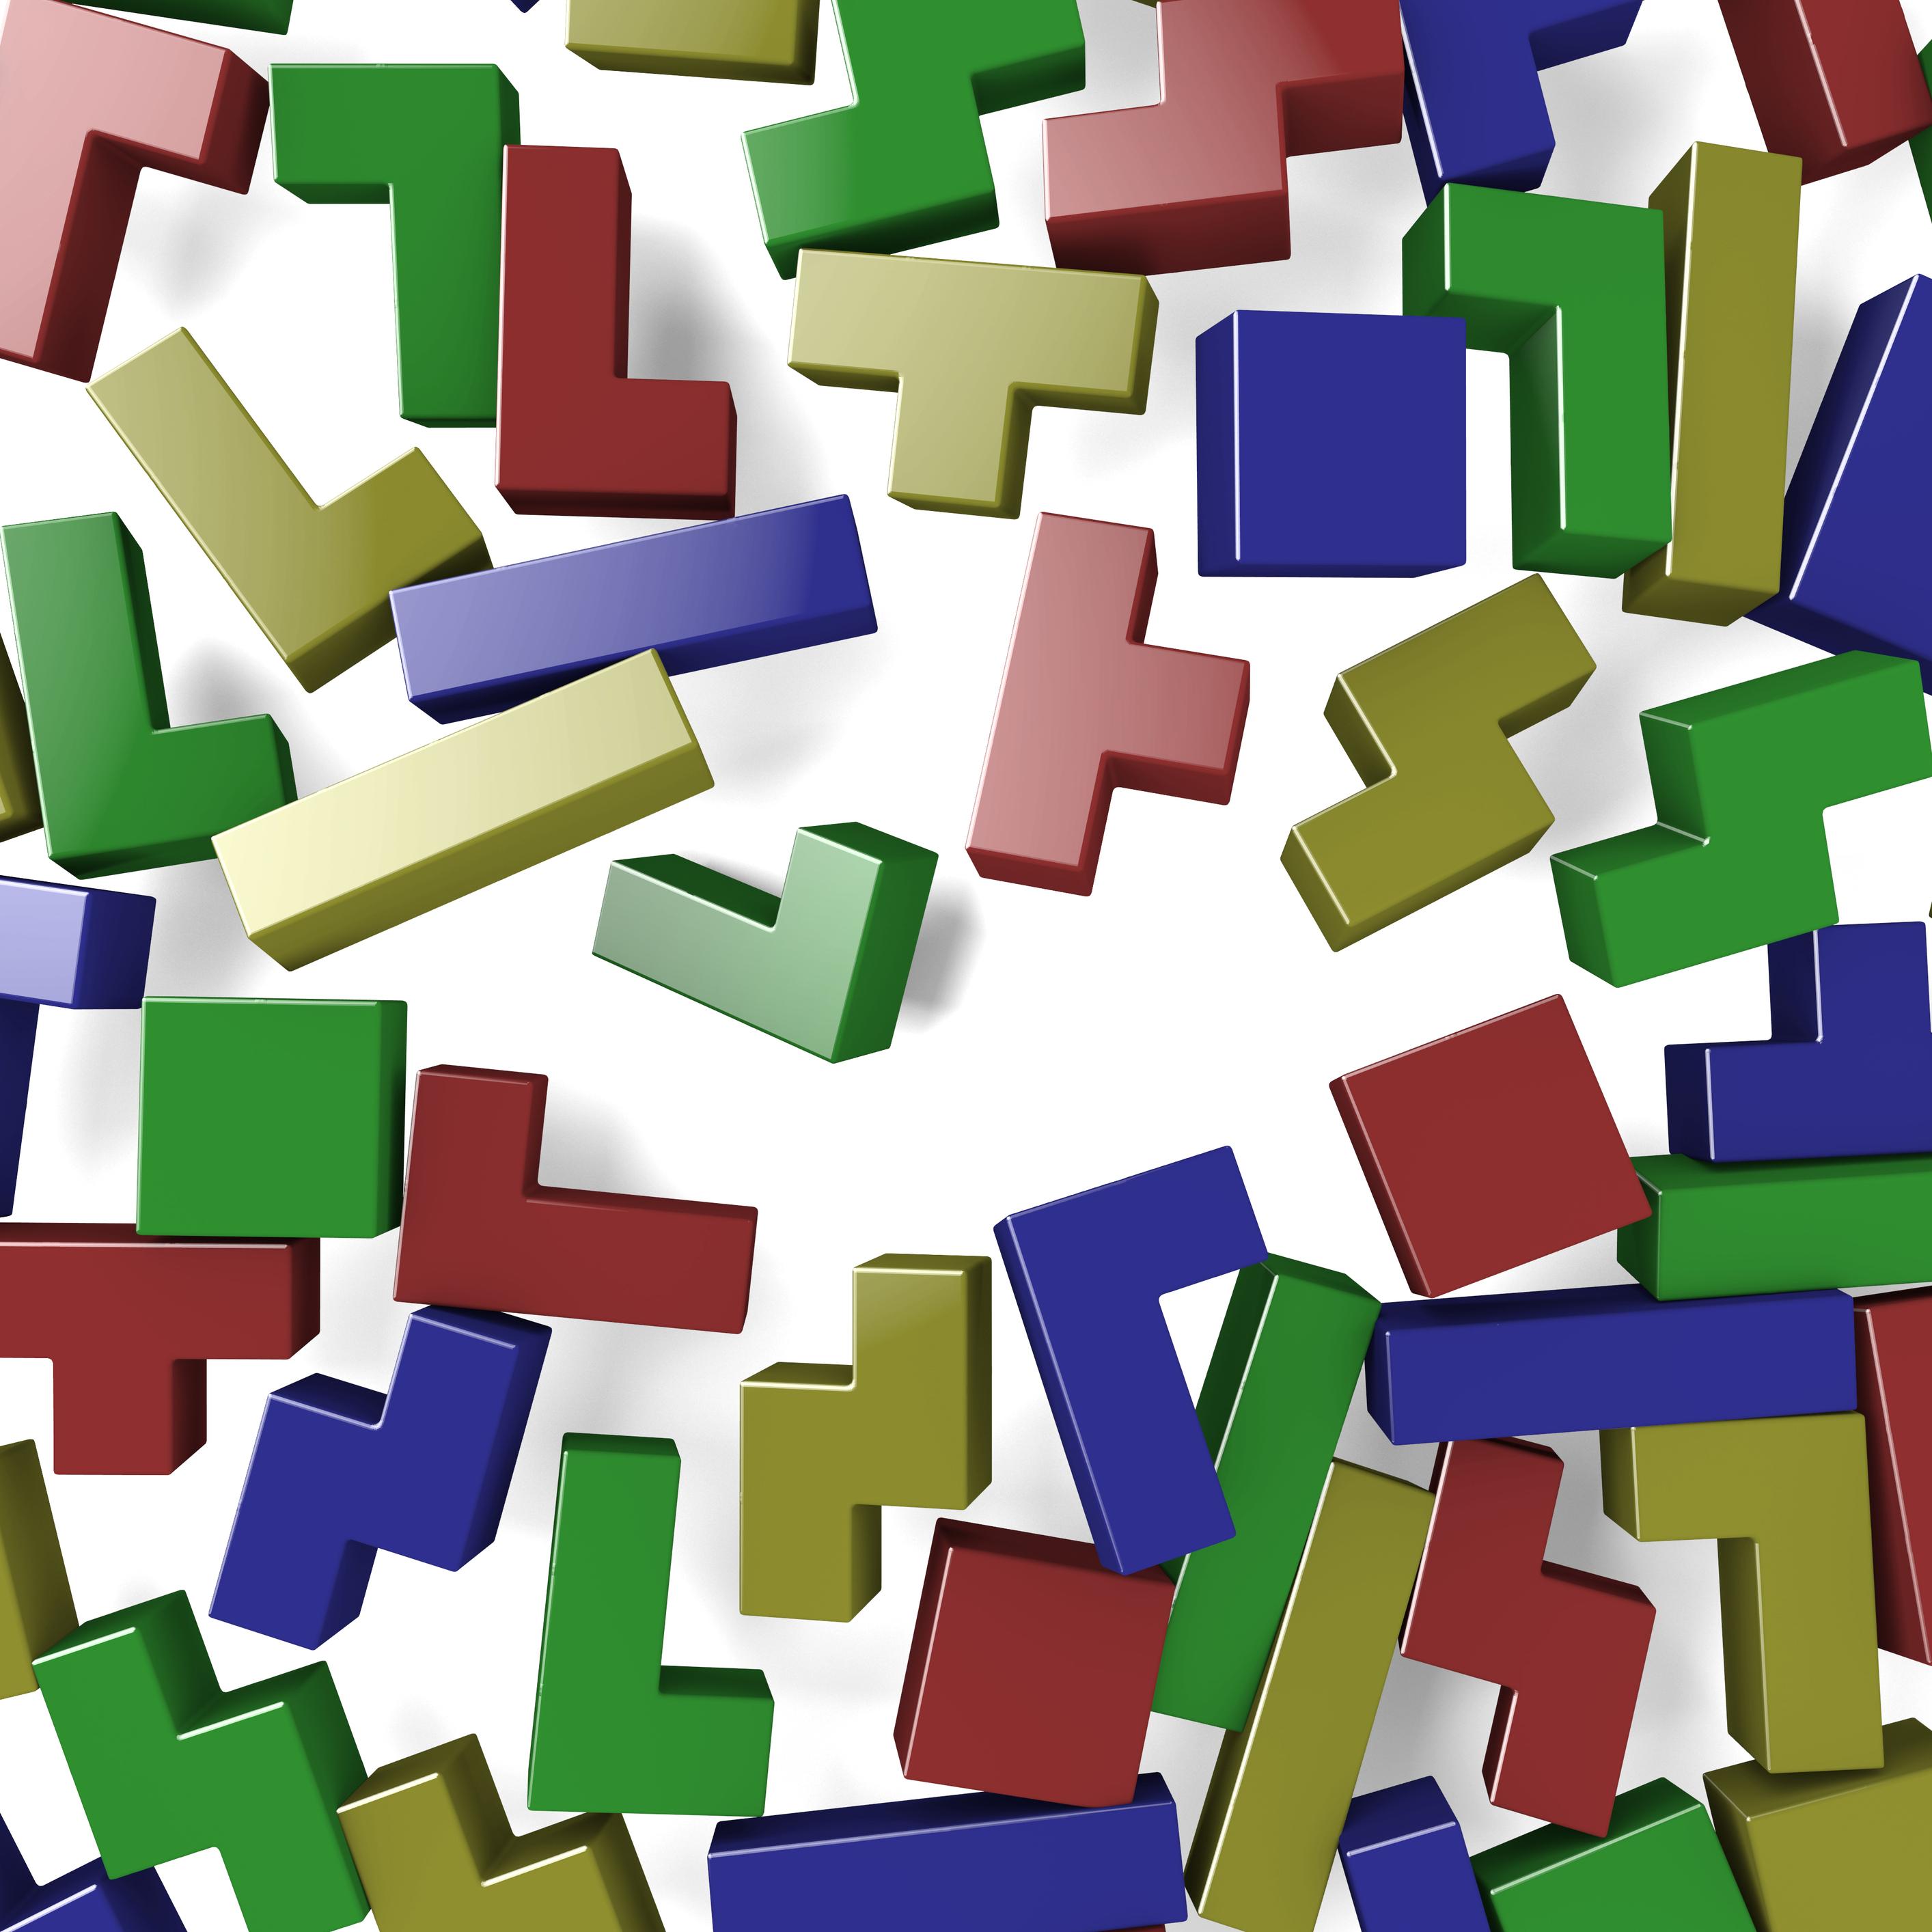 Tetris Turns 30